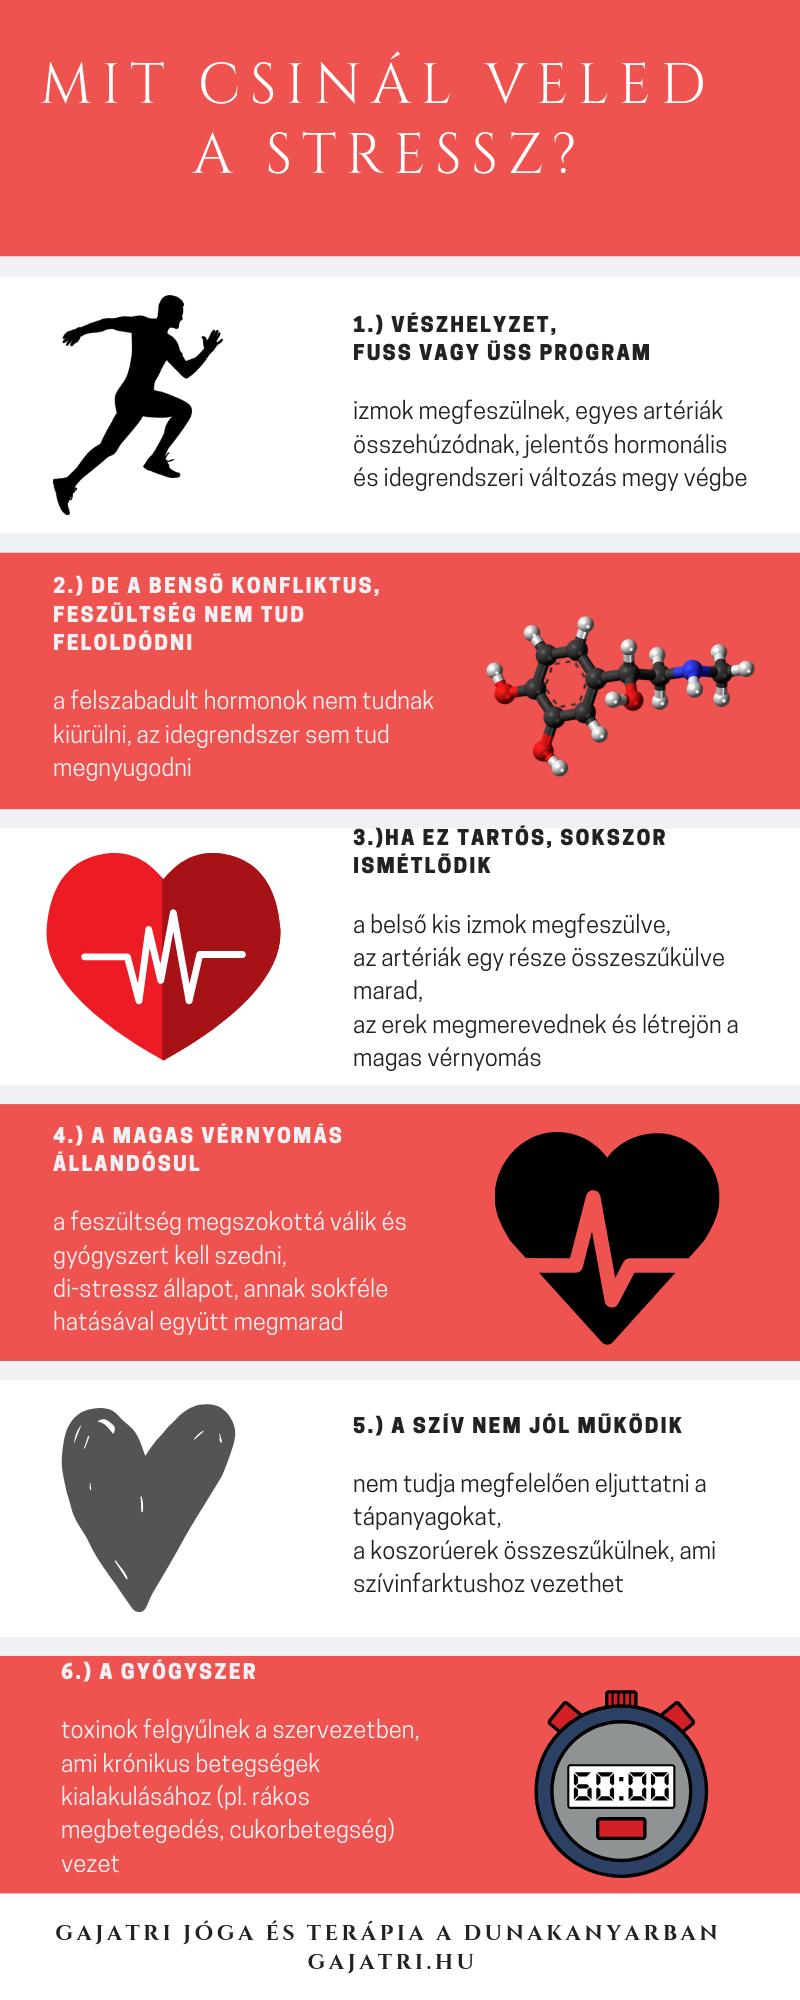 magas vérnyomás pacemaker vastagbél és magas vérnyomás